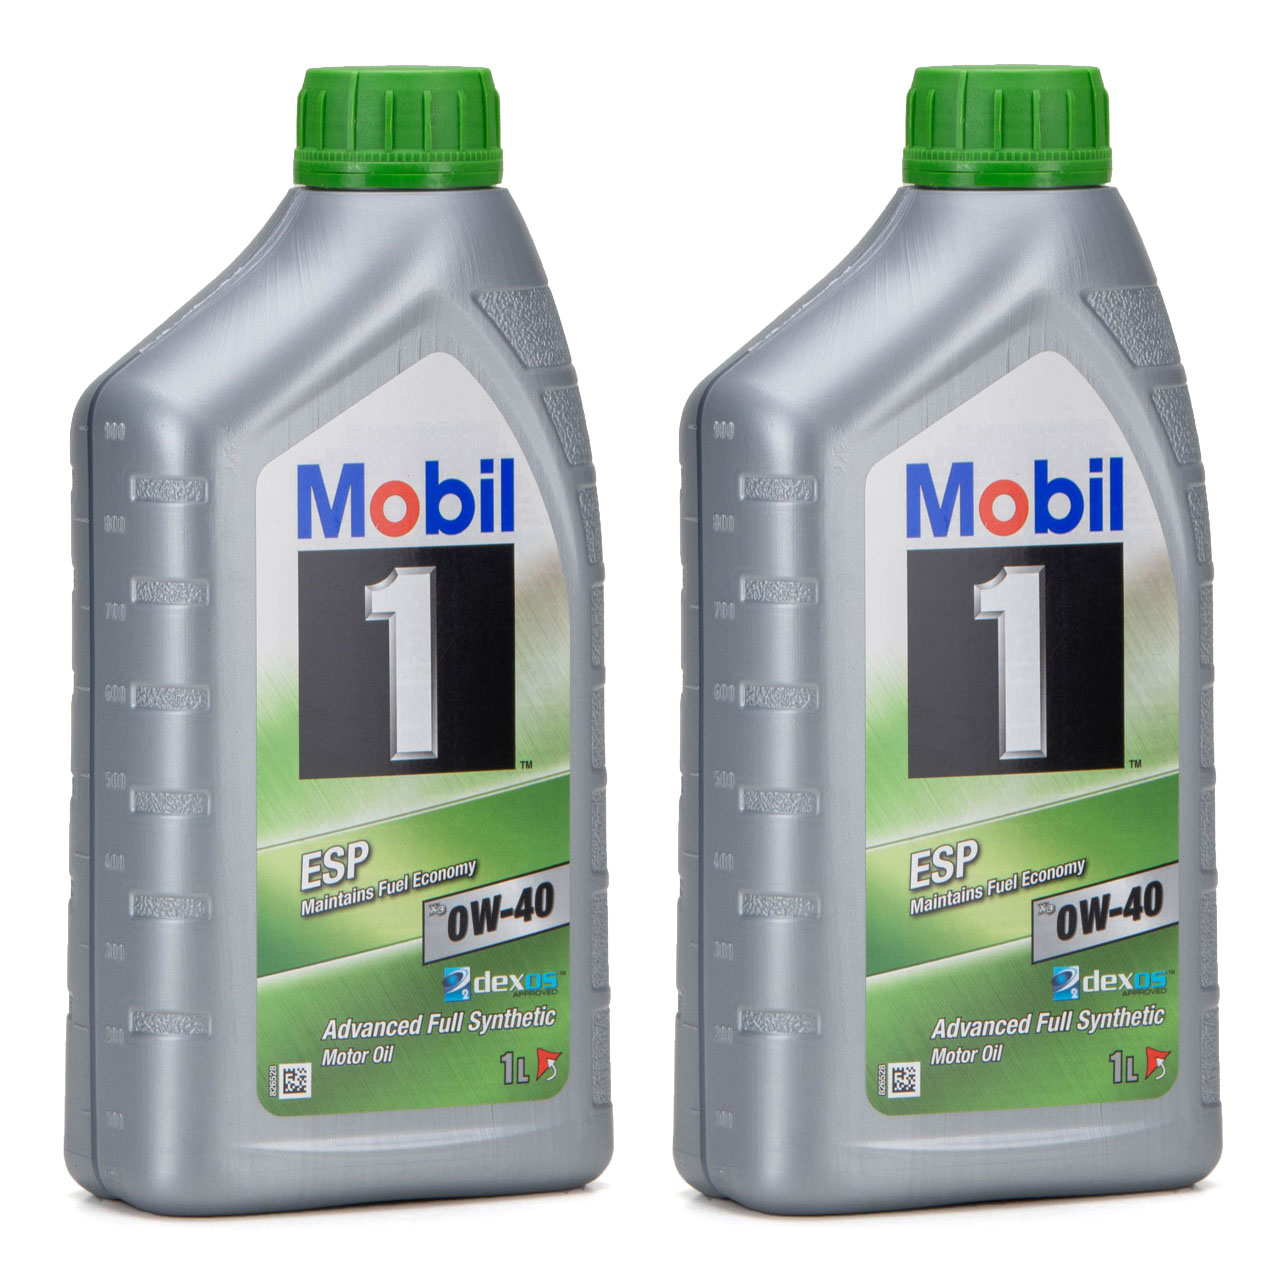 Mobil 1 ESP X3 C40 Motoröl Öl 0W-40 0W40 dexos2 PORSCHE C40 VW 511.00 - 2 Liter